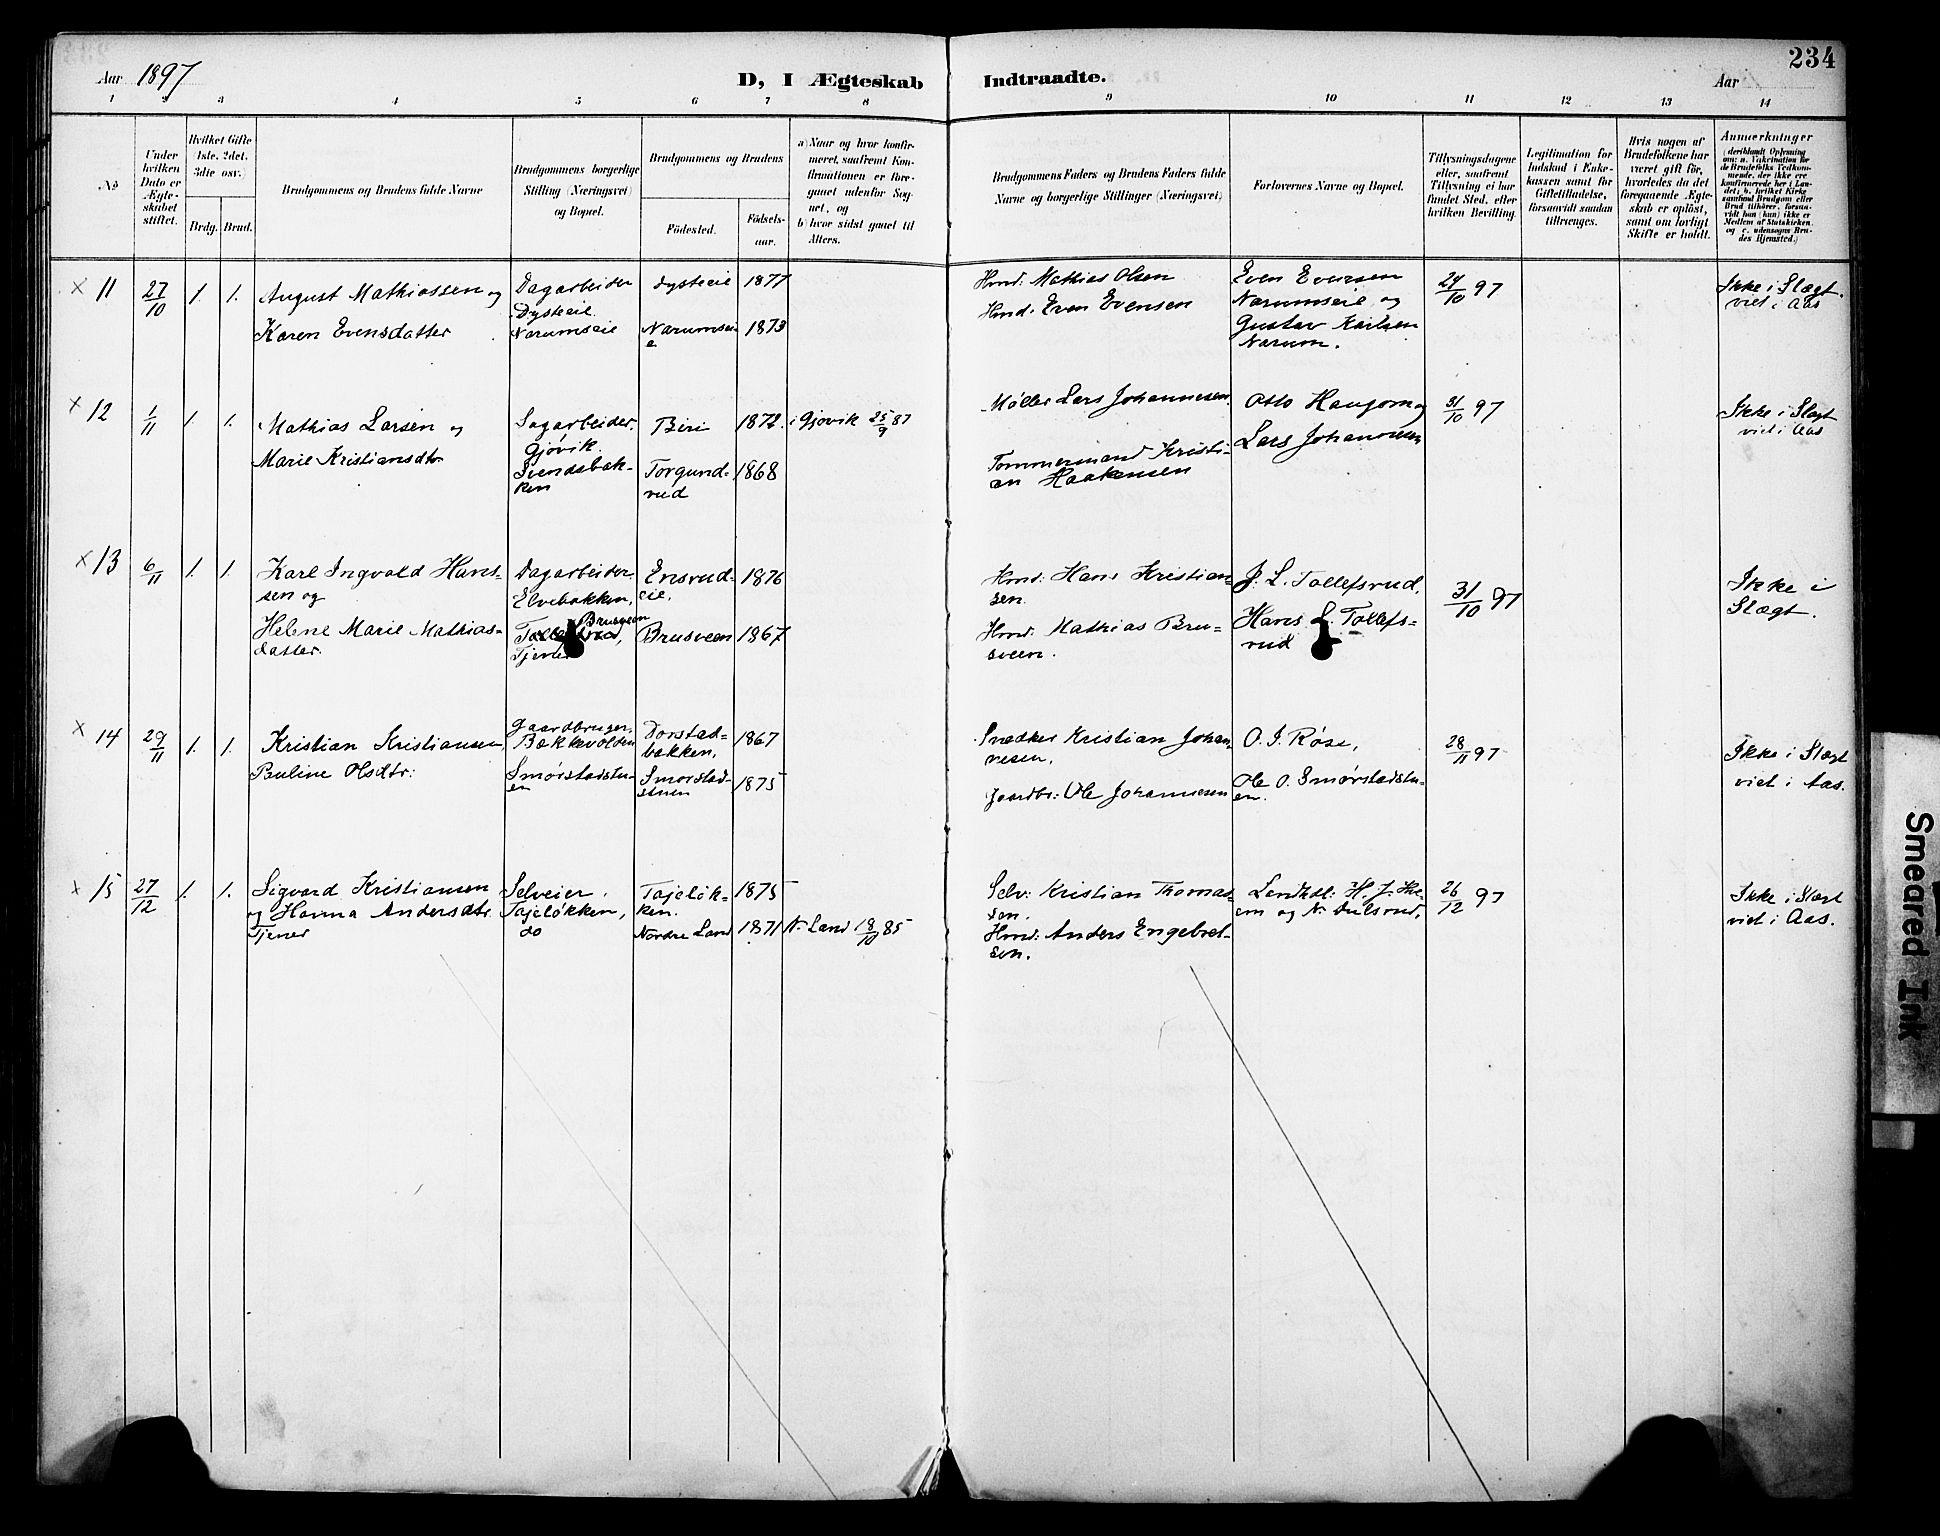 SAH, Vestre Toten prestekontor, H/Ha/Haa/L0013: Ministerialbok nr. 13, 1895-1911, s. 234